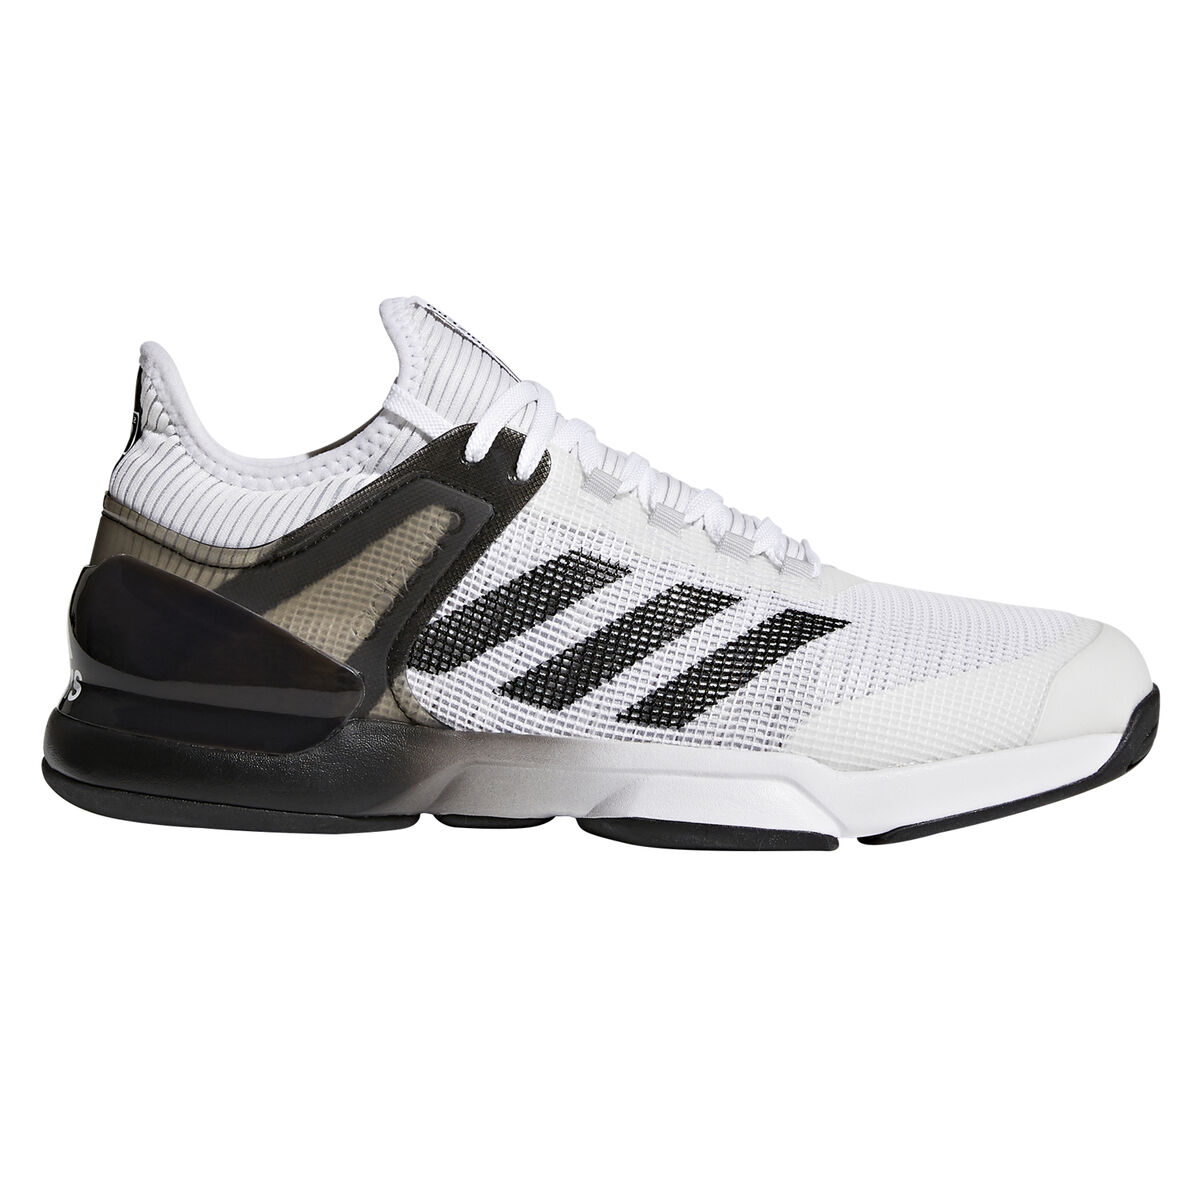 45eecb35338 Images. adidas adizero Ubersonic 2.0 Men  39 s Tennis Shoes - White Black